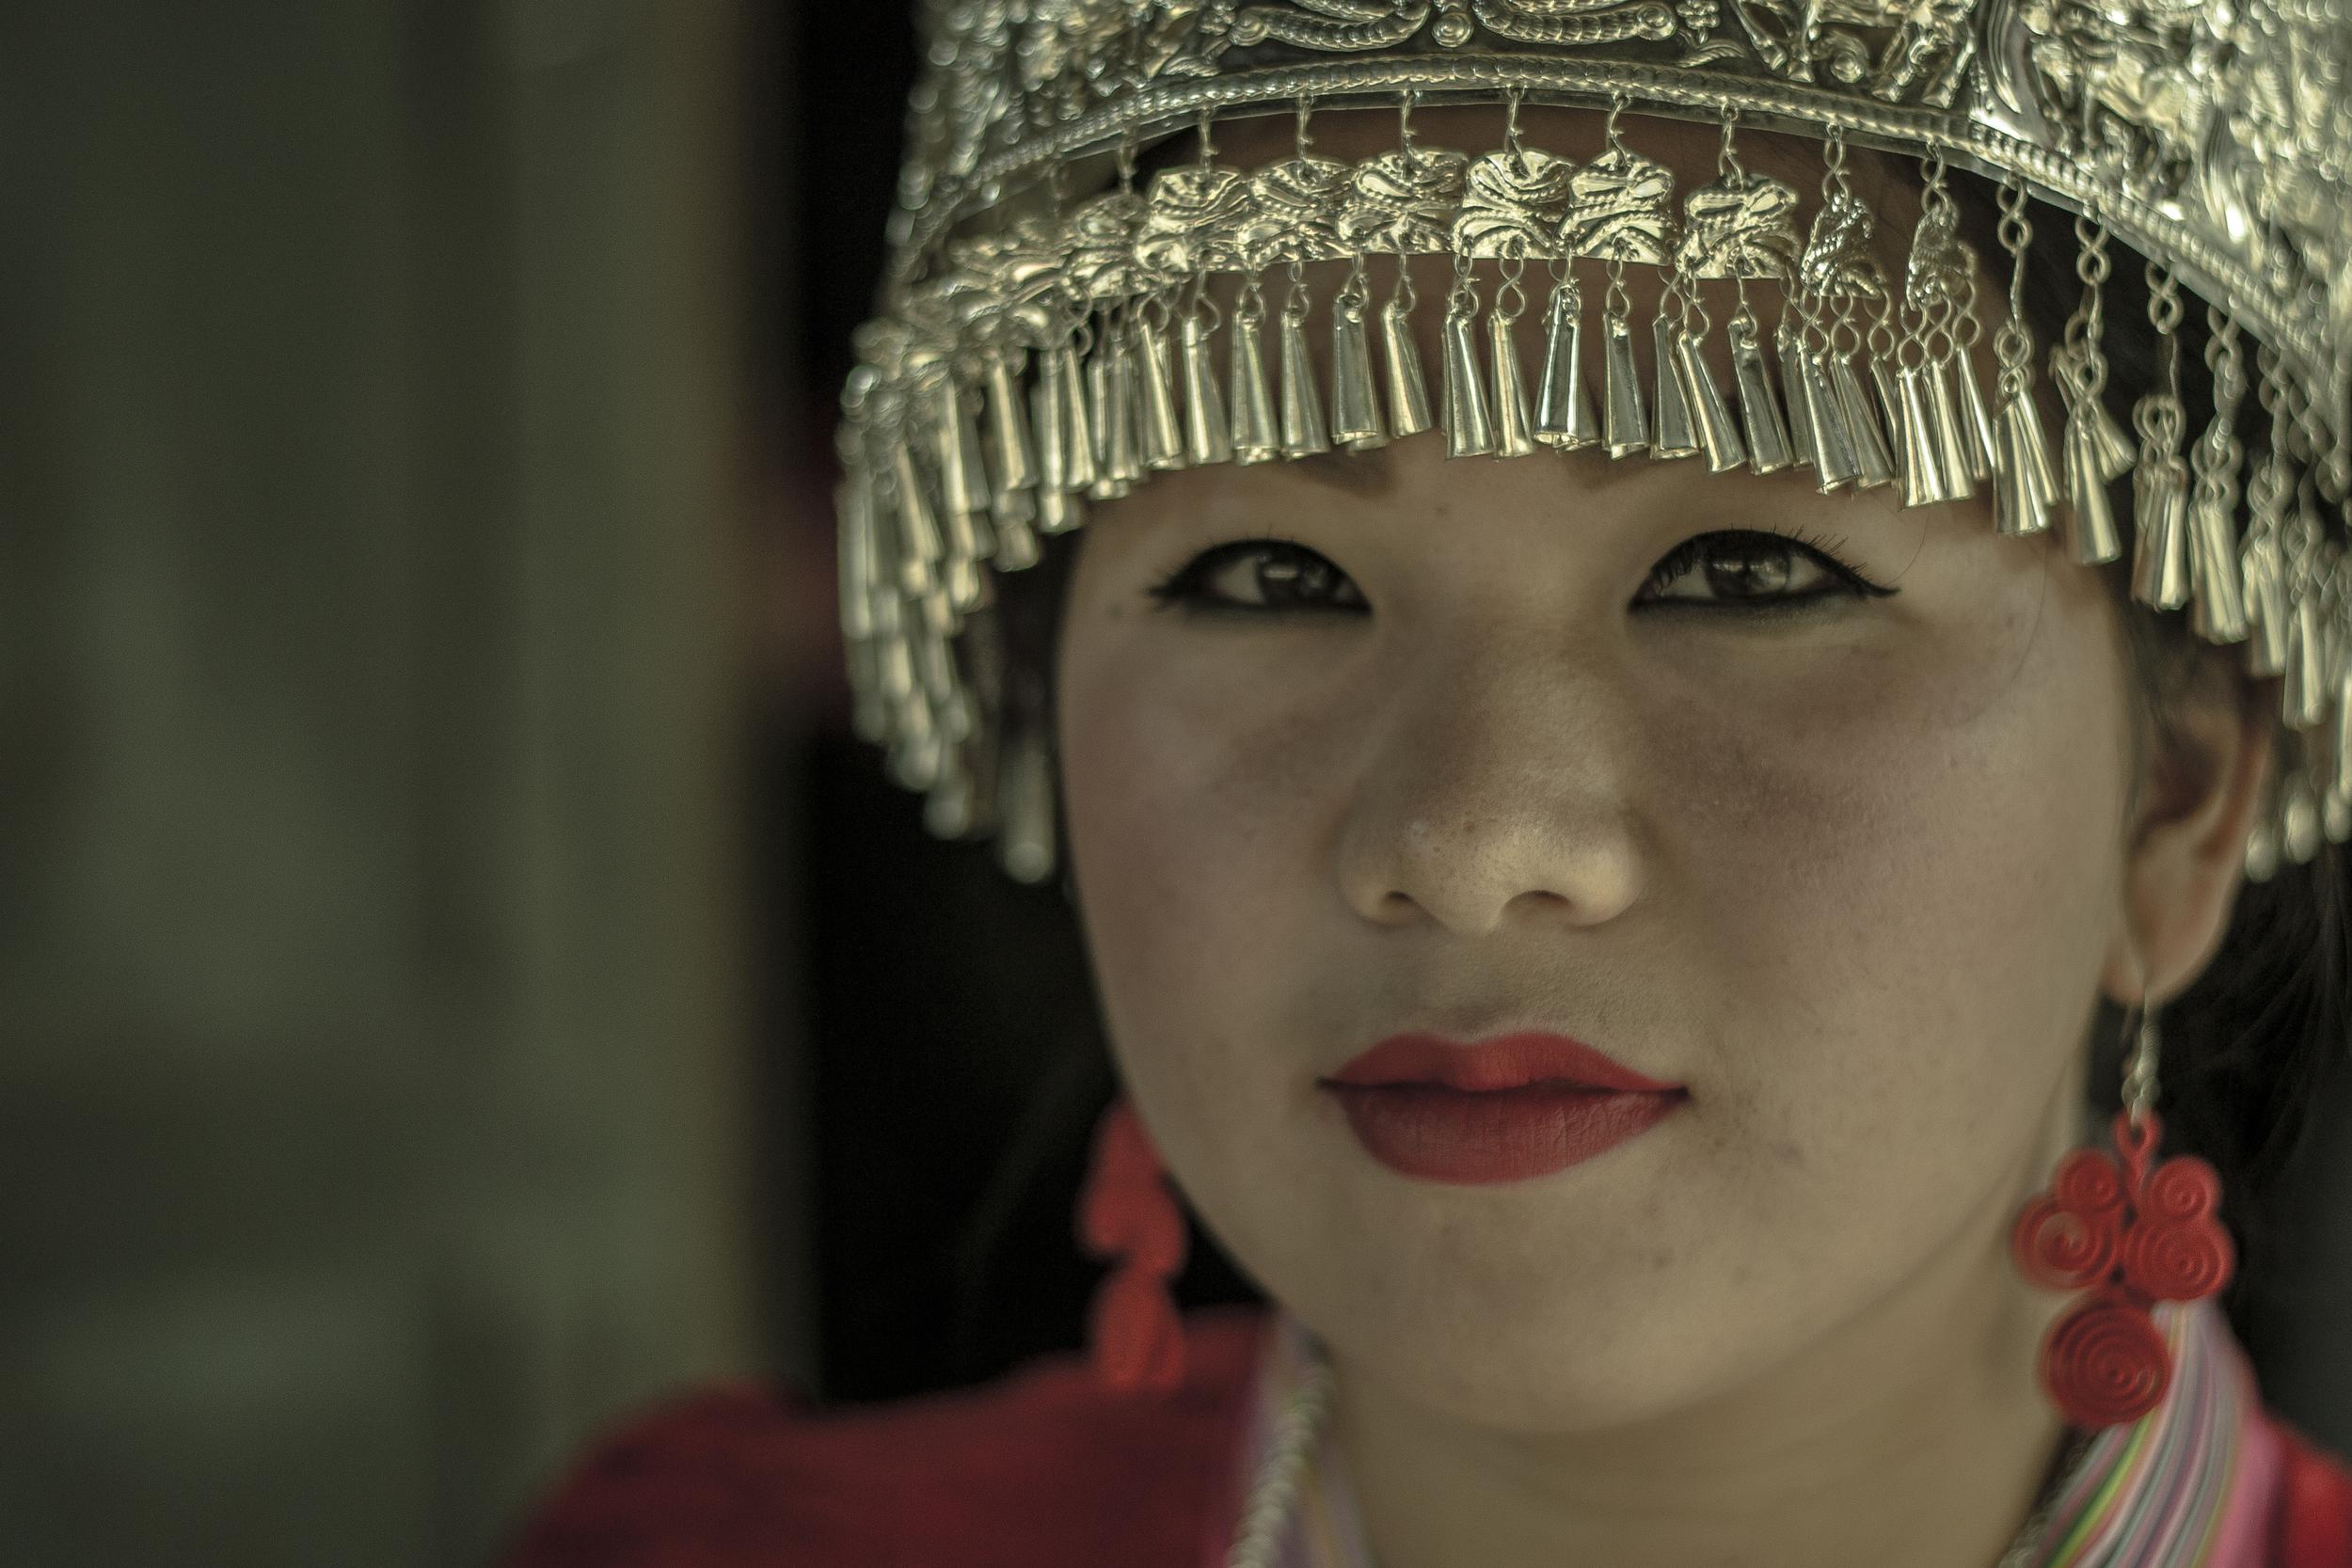 Nag ready for Hmong New Year festivities. Laos